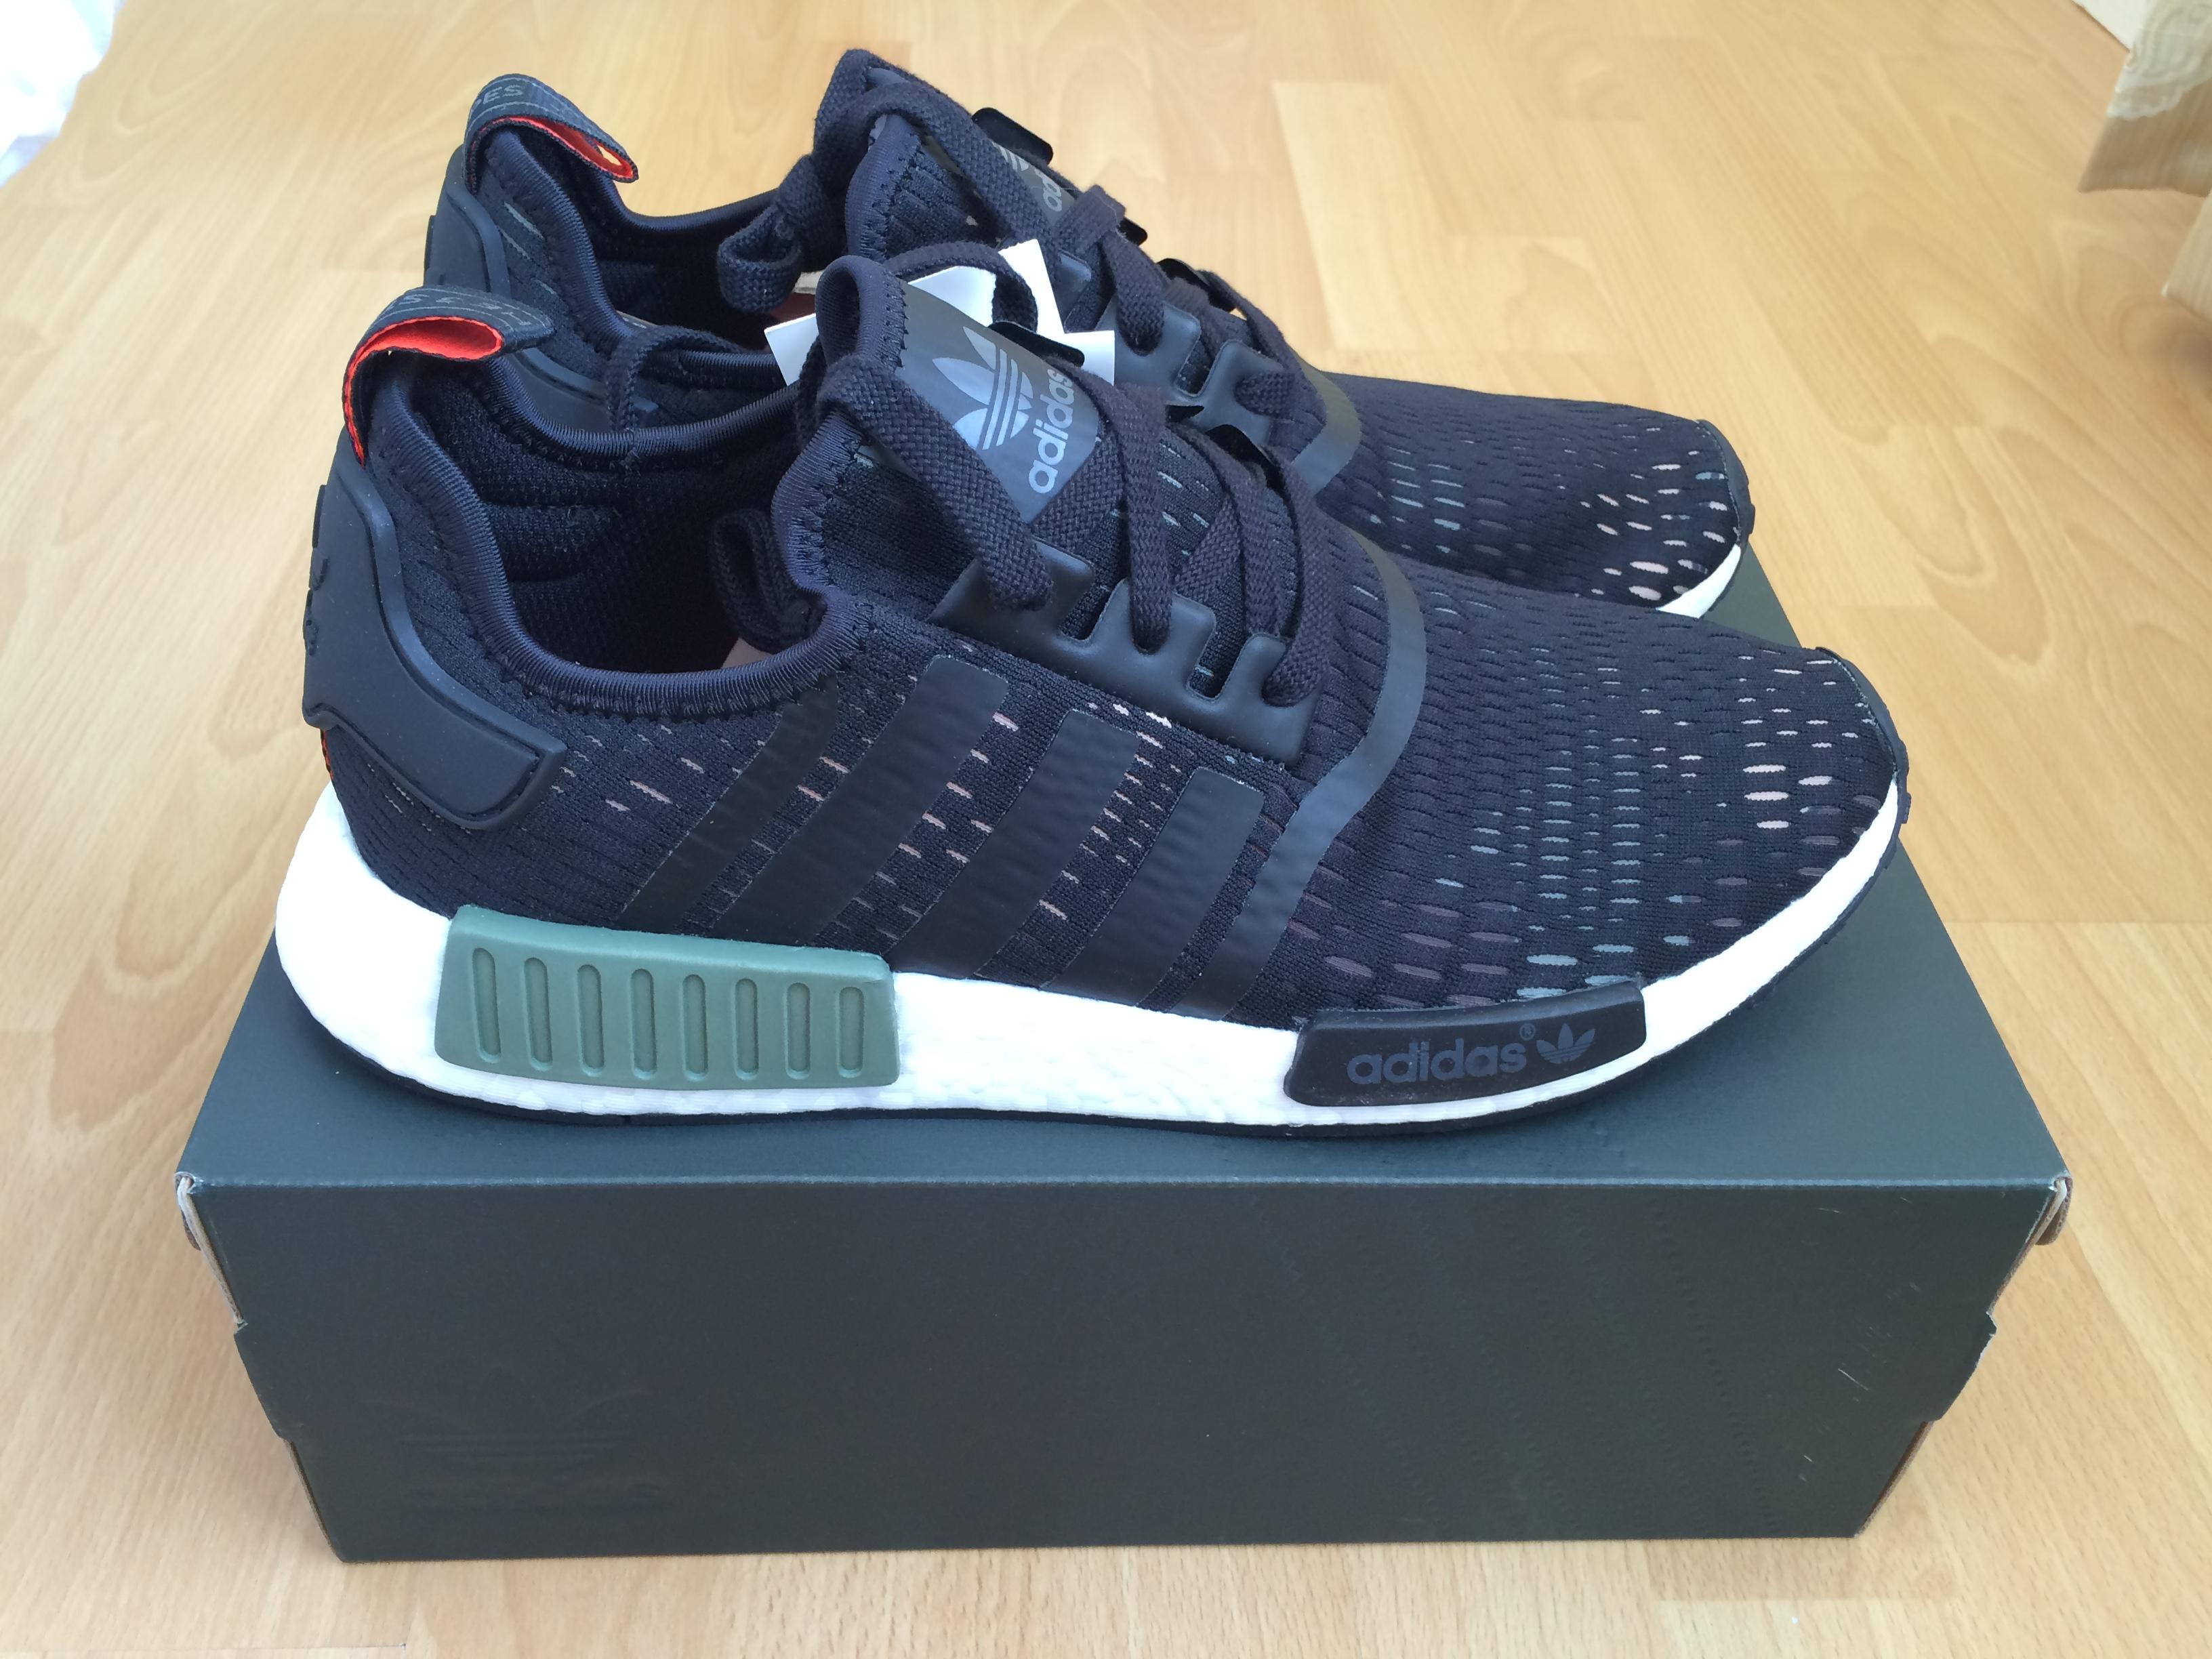 adidas nmd r1 black and green